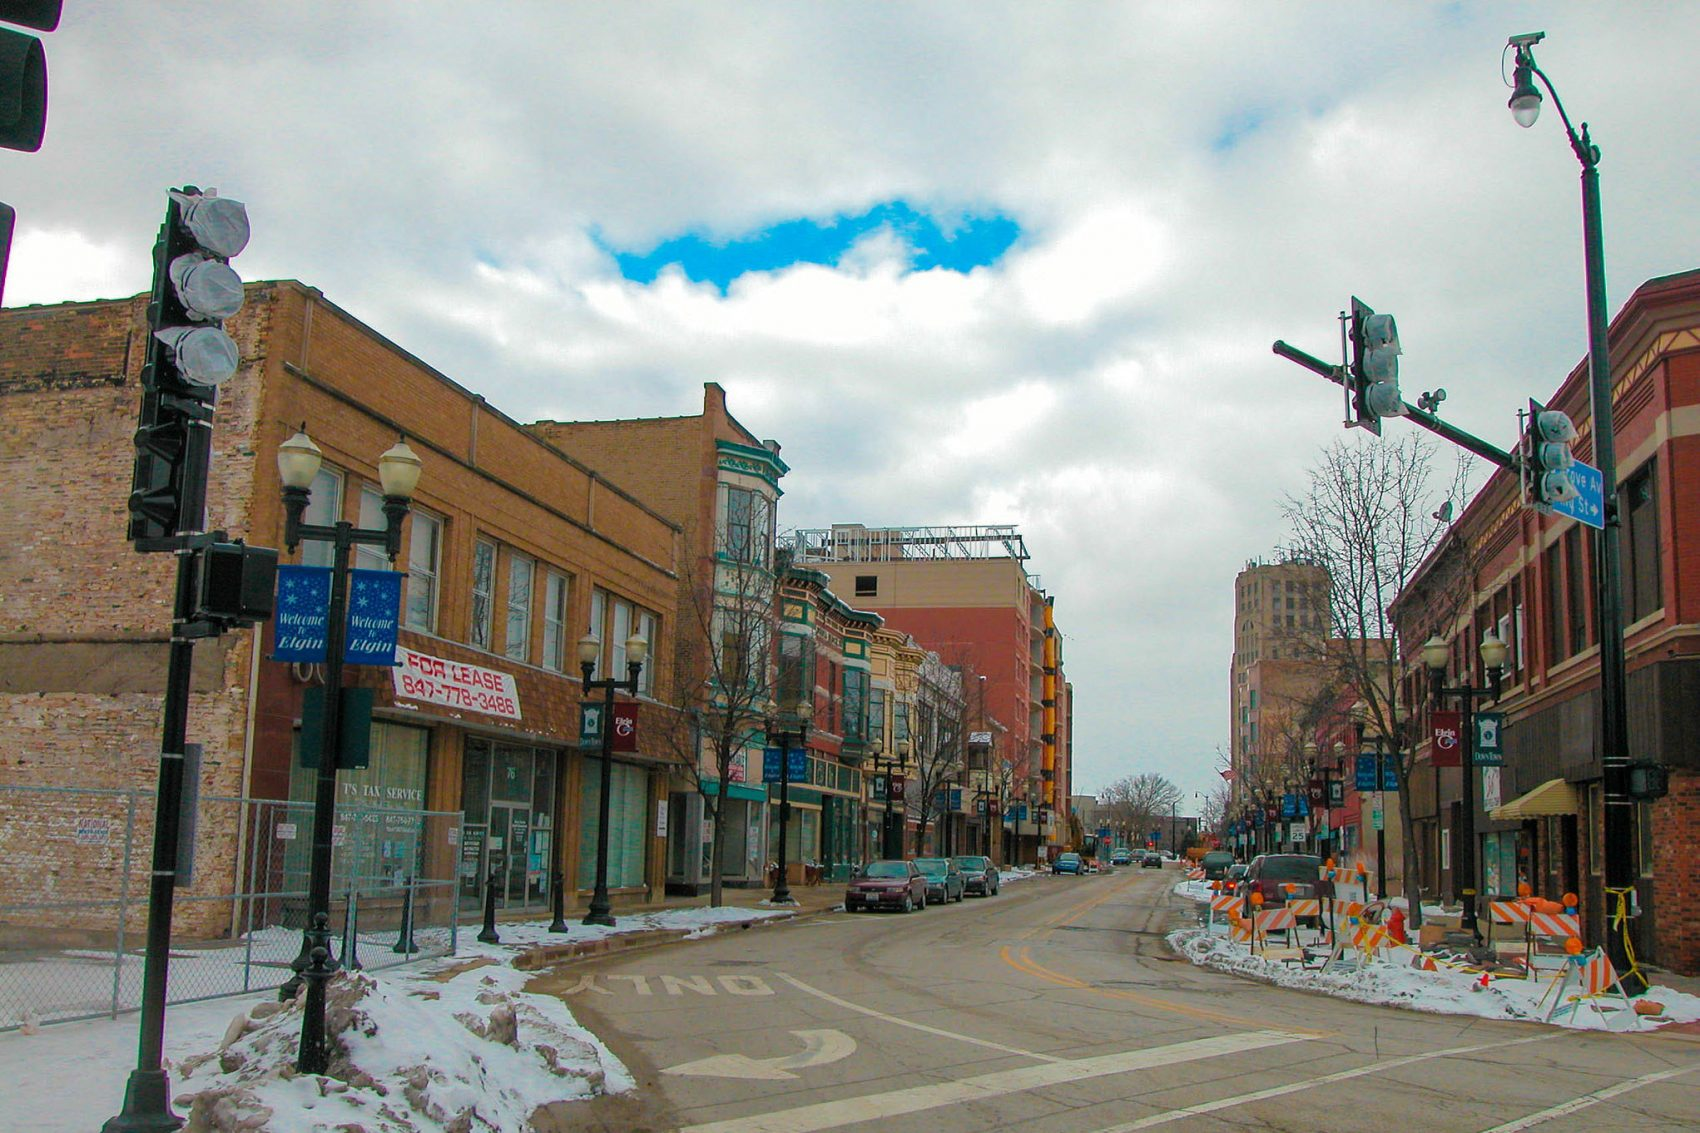 Grove Avenue in Elgin, Ill. (David Wilson/Flickr)